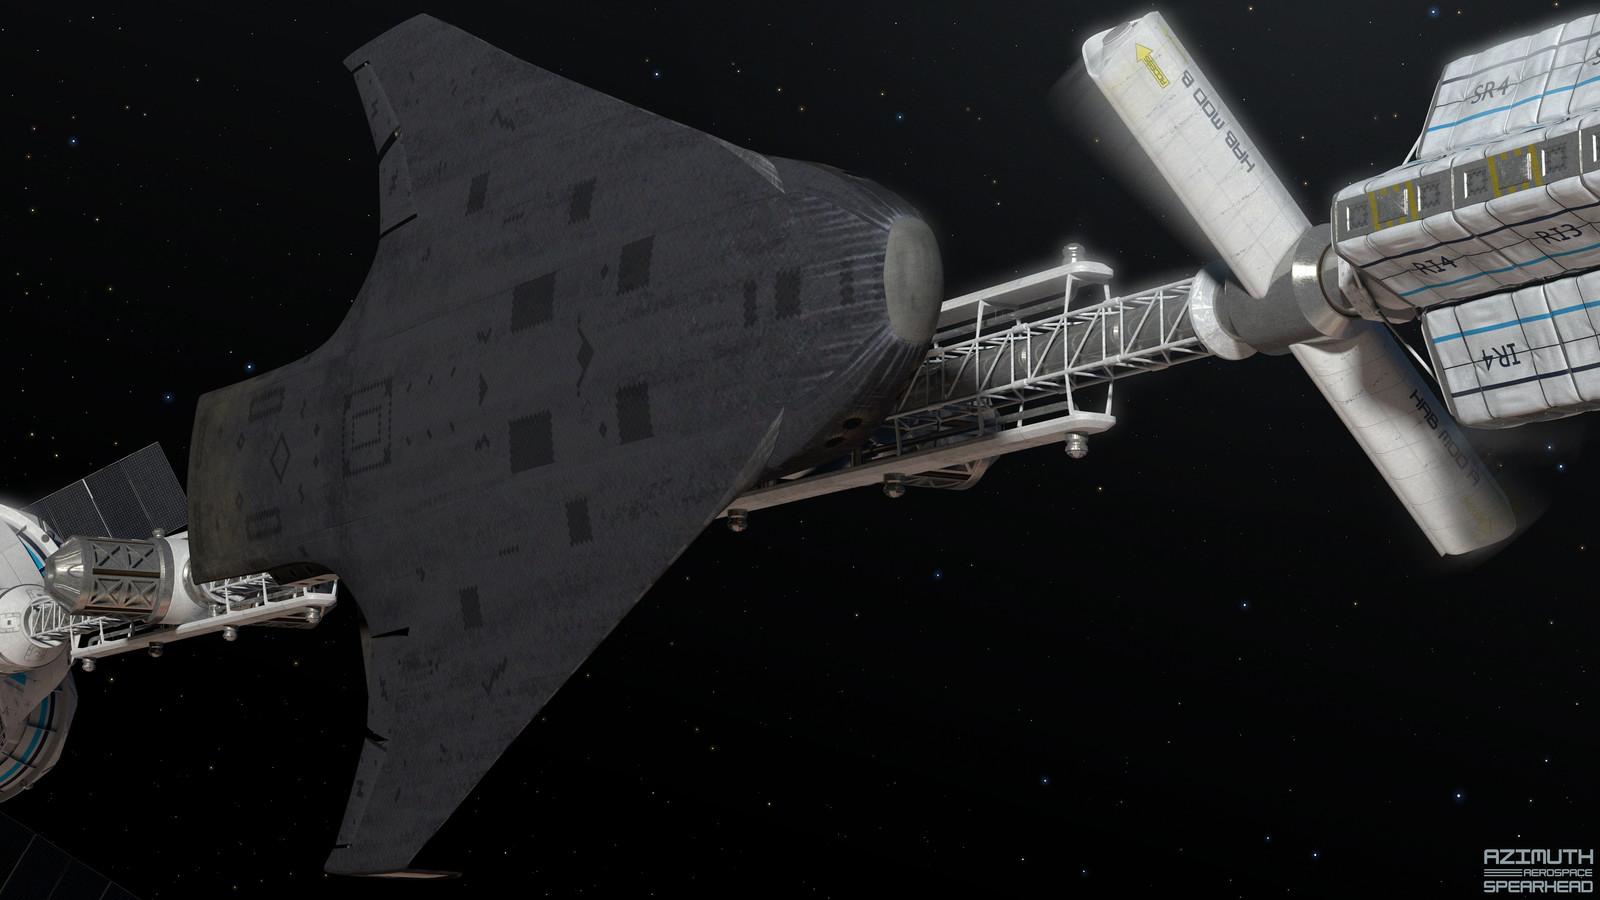 Docked at an interplanetary vehicle